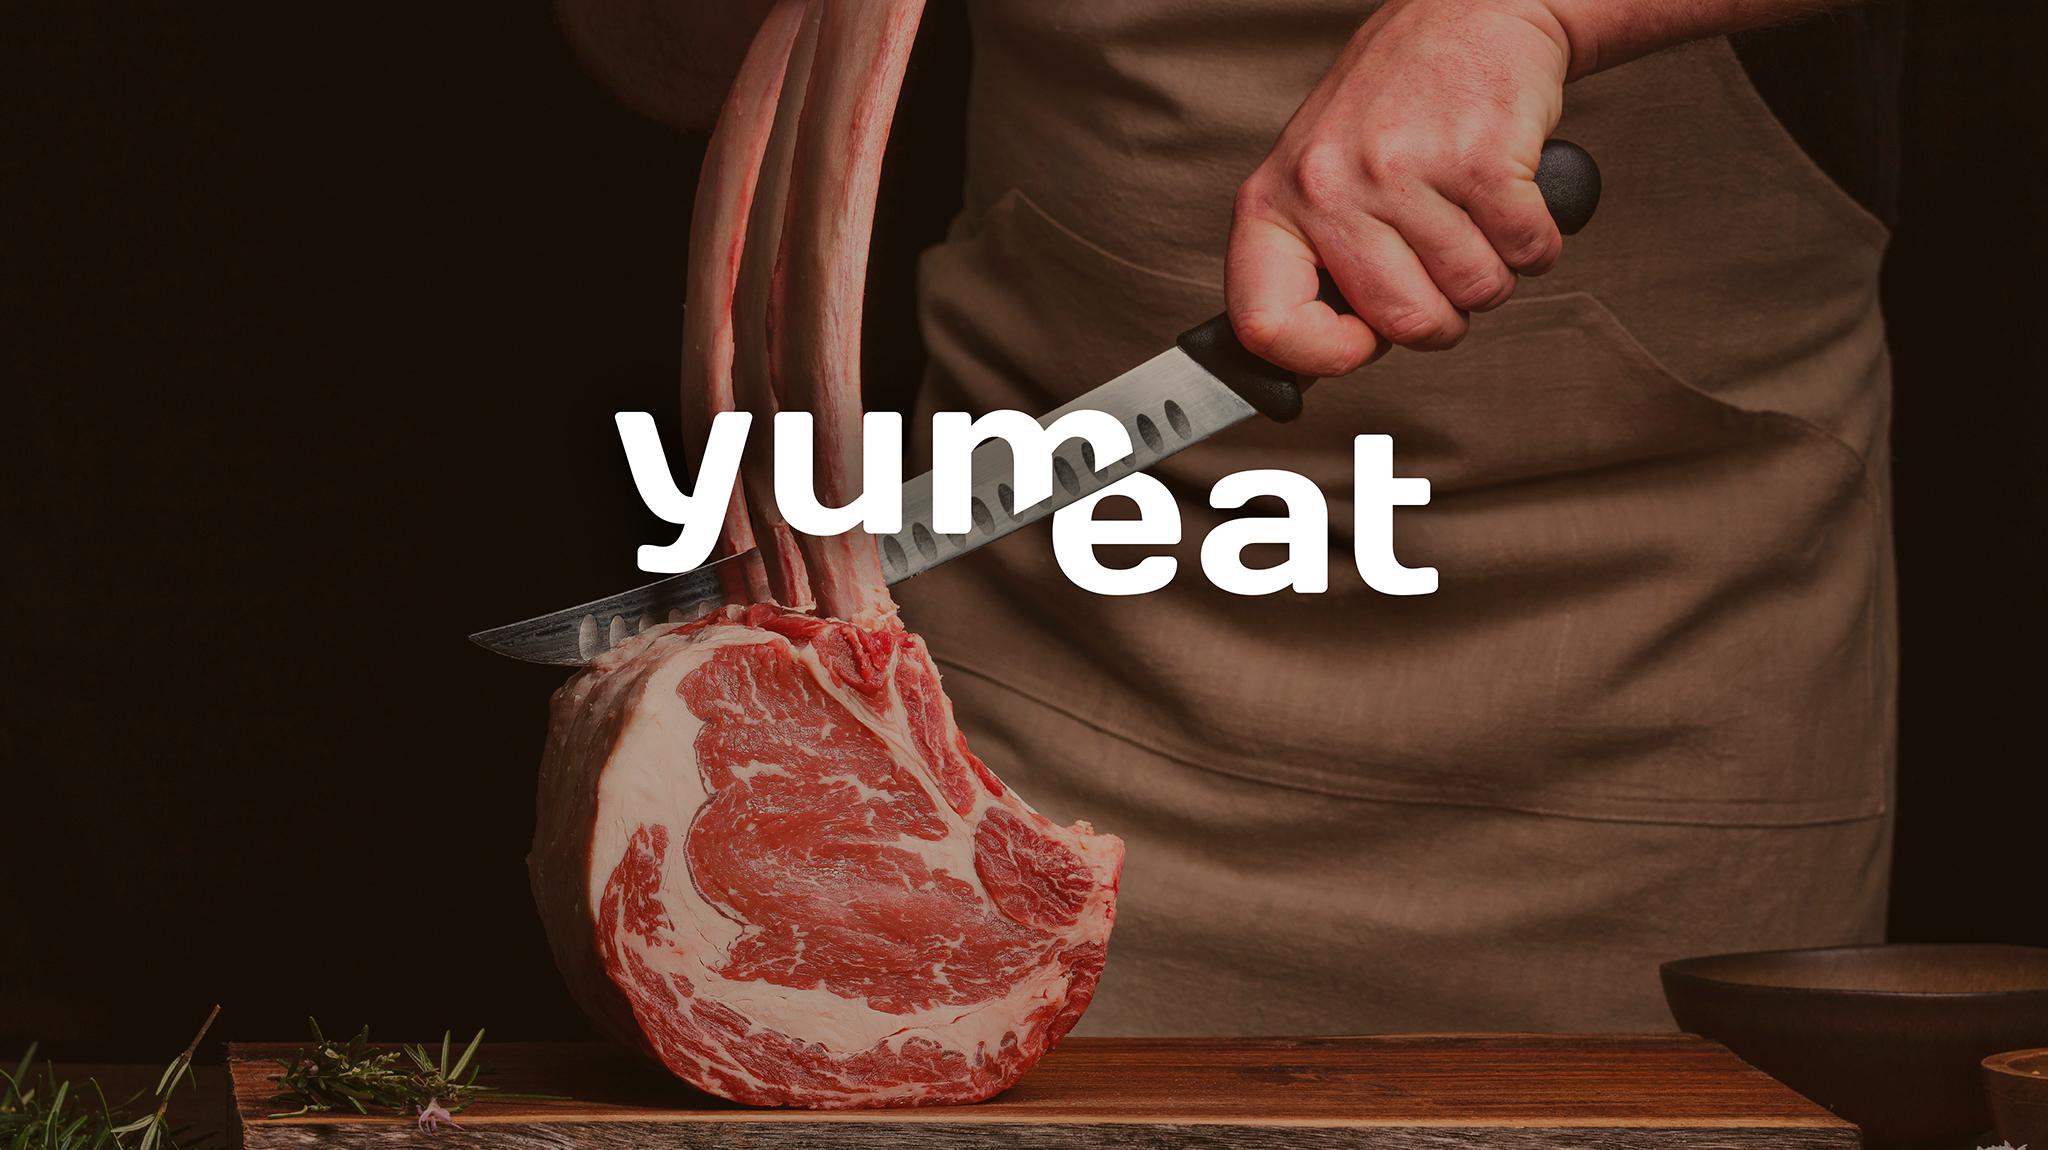 Yumeat   Get #1 Branding Your Business   Branding Agency Branding